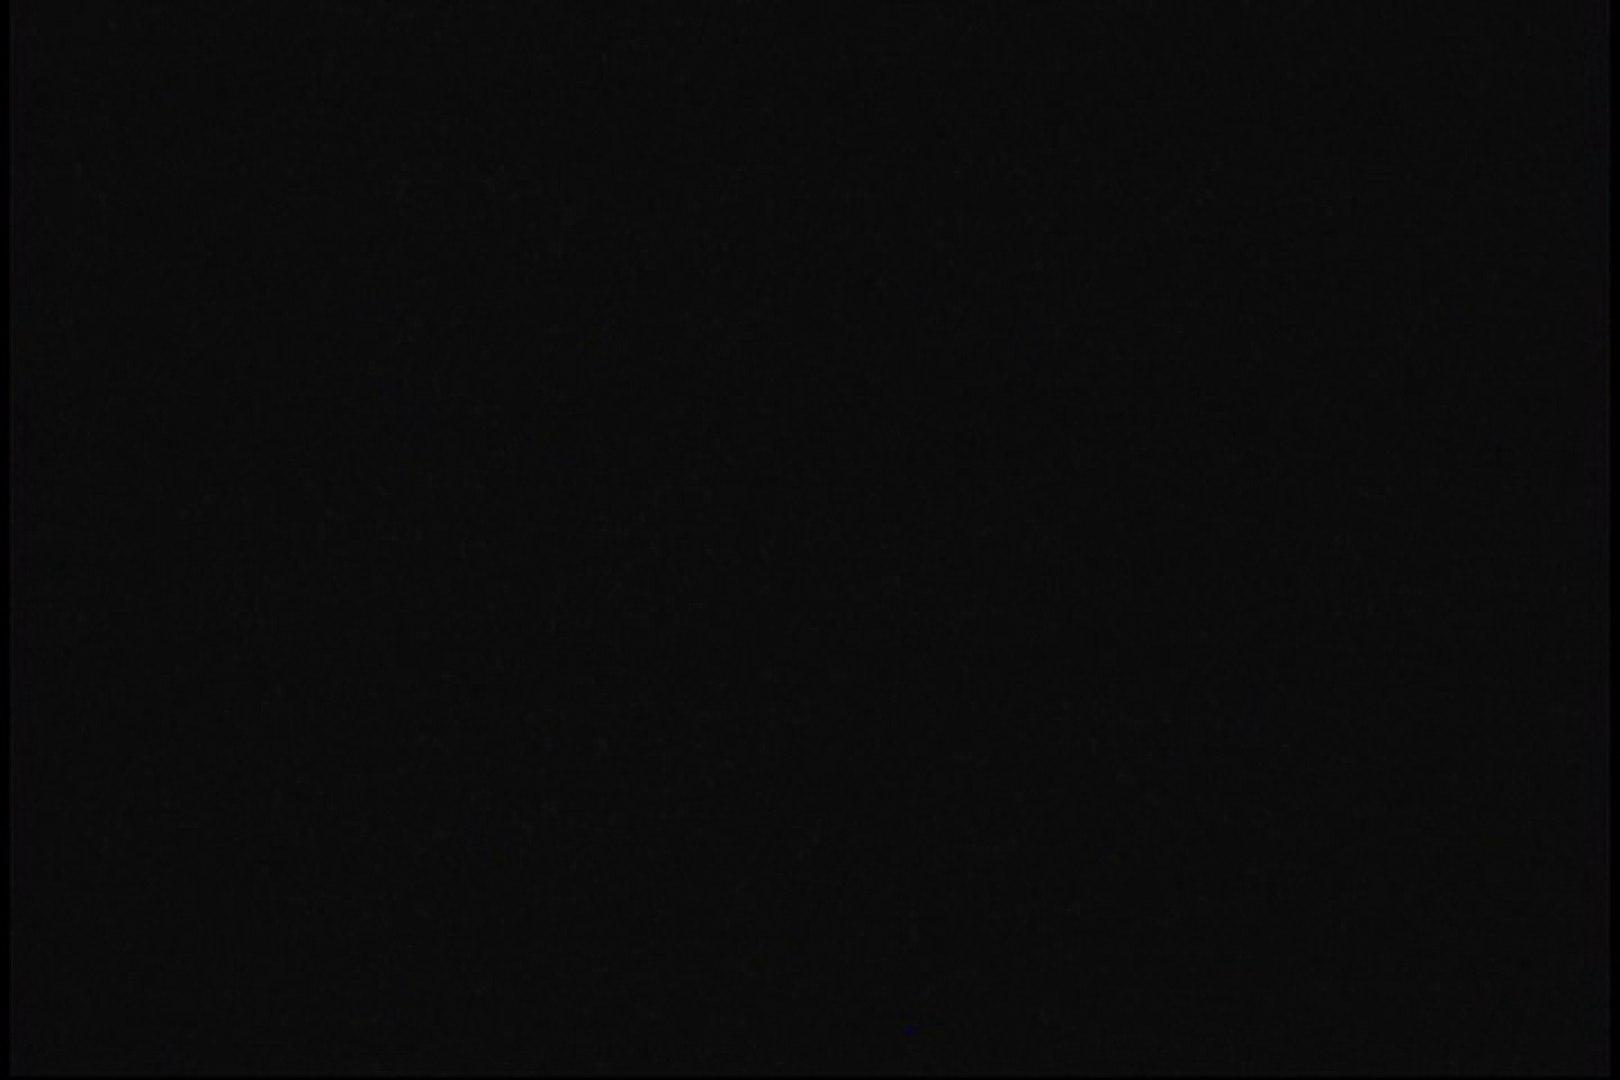 No.3 巨乳ギャルに接近!たわわに実ったオッパイ! 盗撮映像大放出 盗み撮り動画キャプチャ 48連発 22